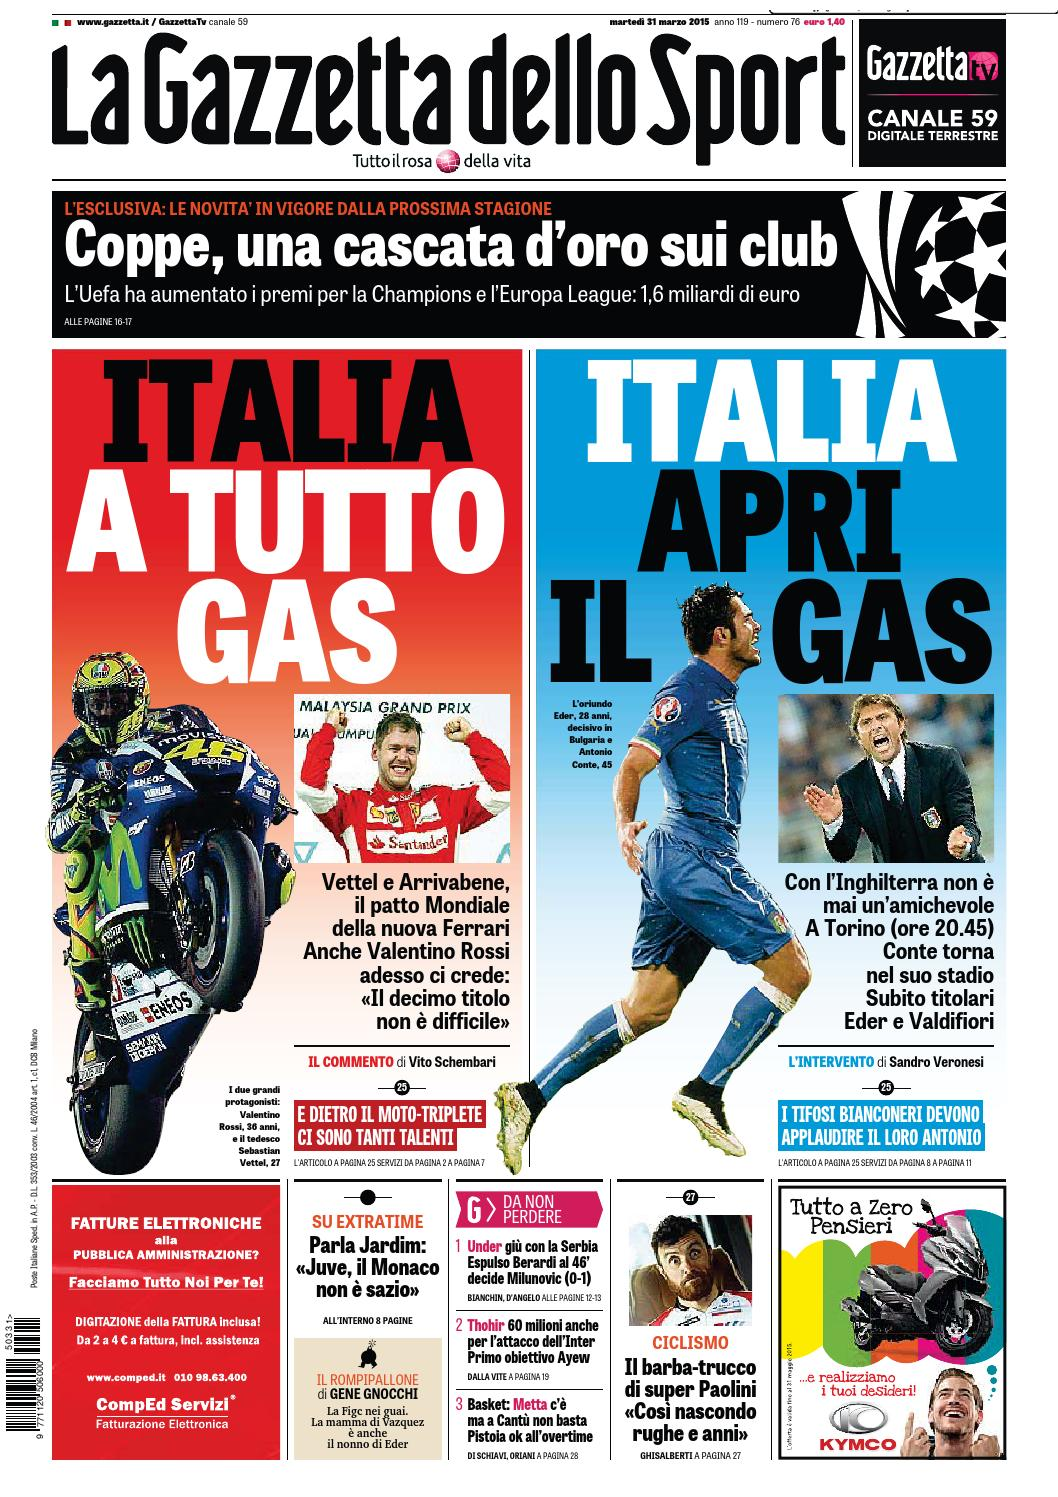 La Gazzetta dello Sport (03-31-2015) by Nguyen Duc Thinh - issuu d52c58aeb687